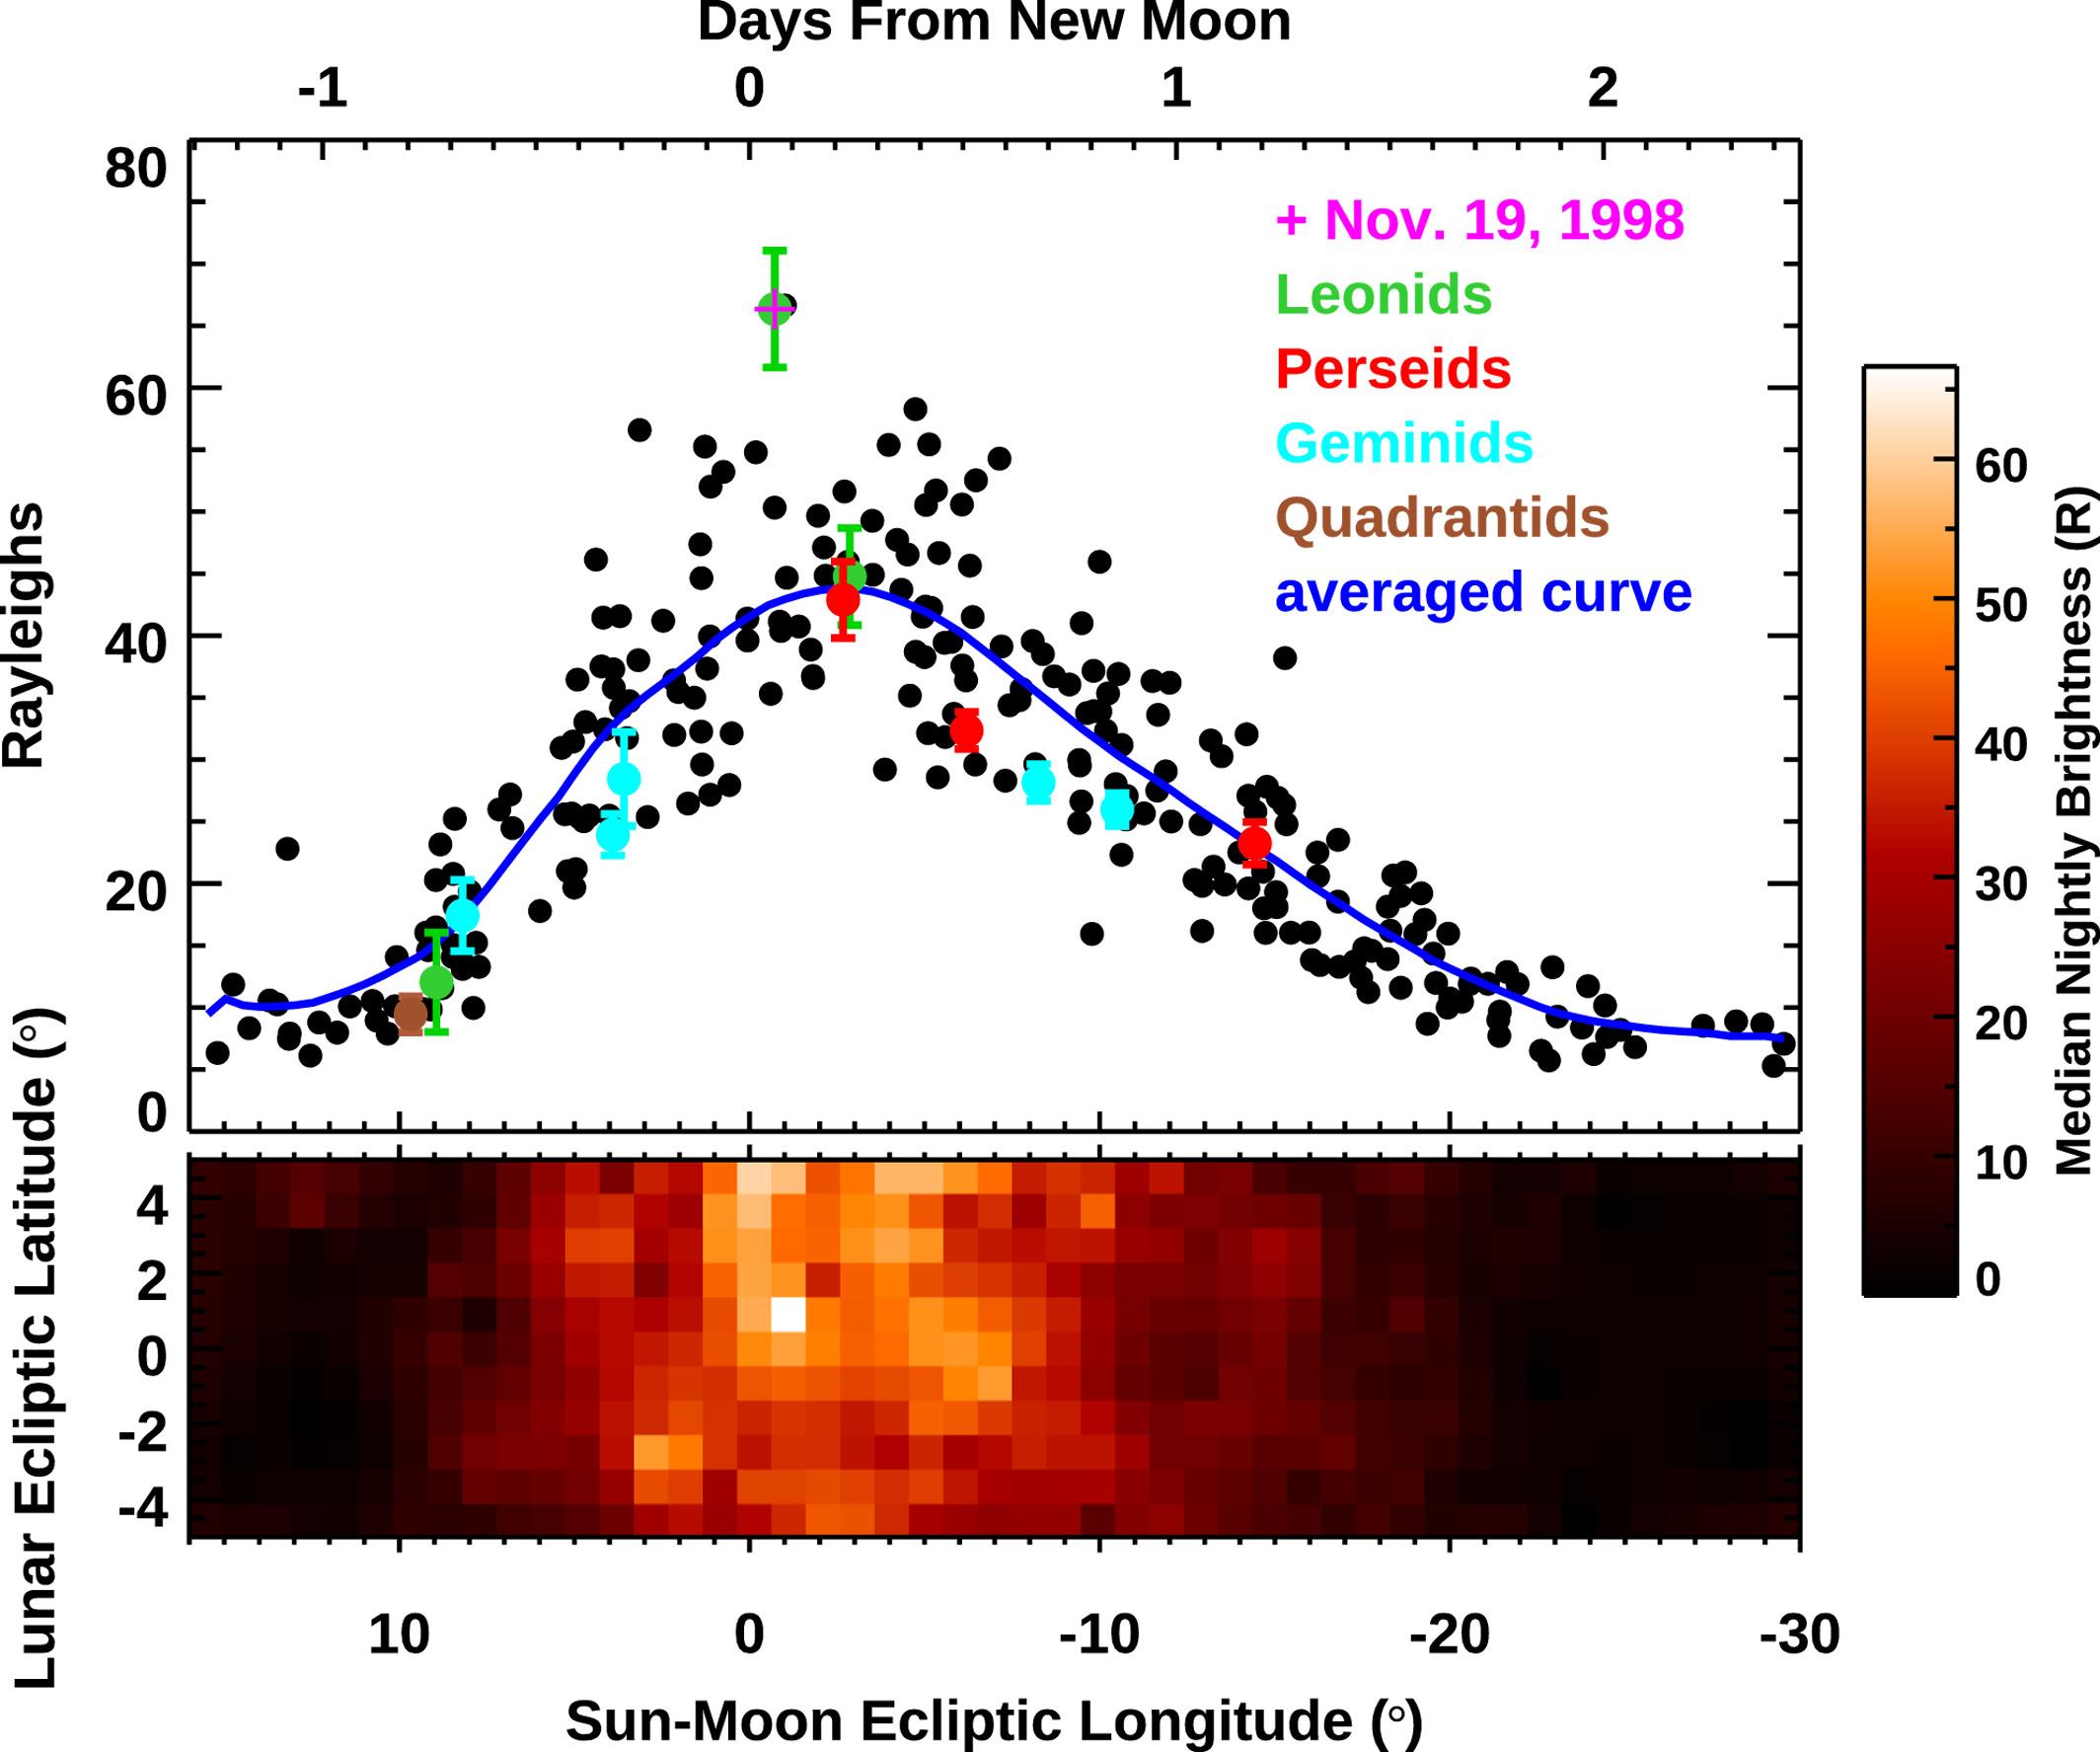 Sodium Moon Spot brightness statistics